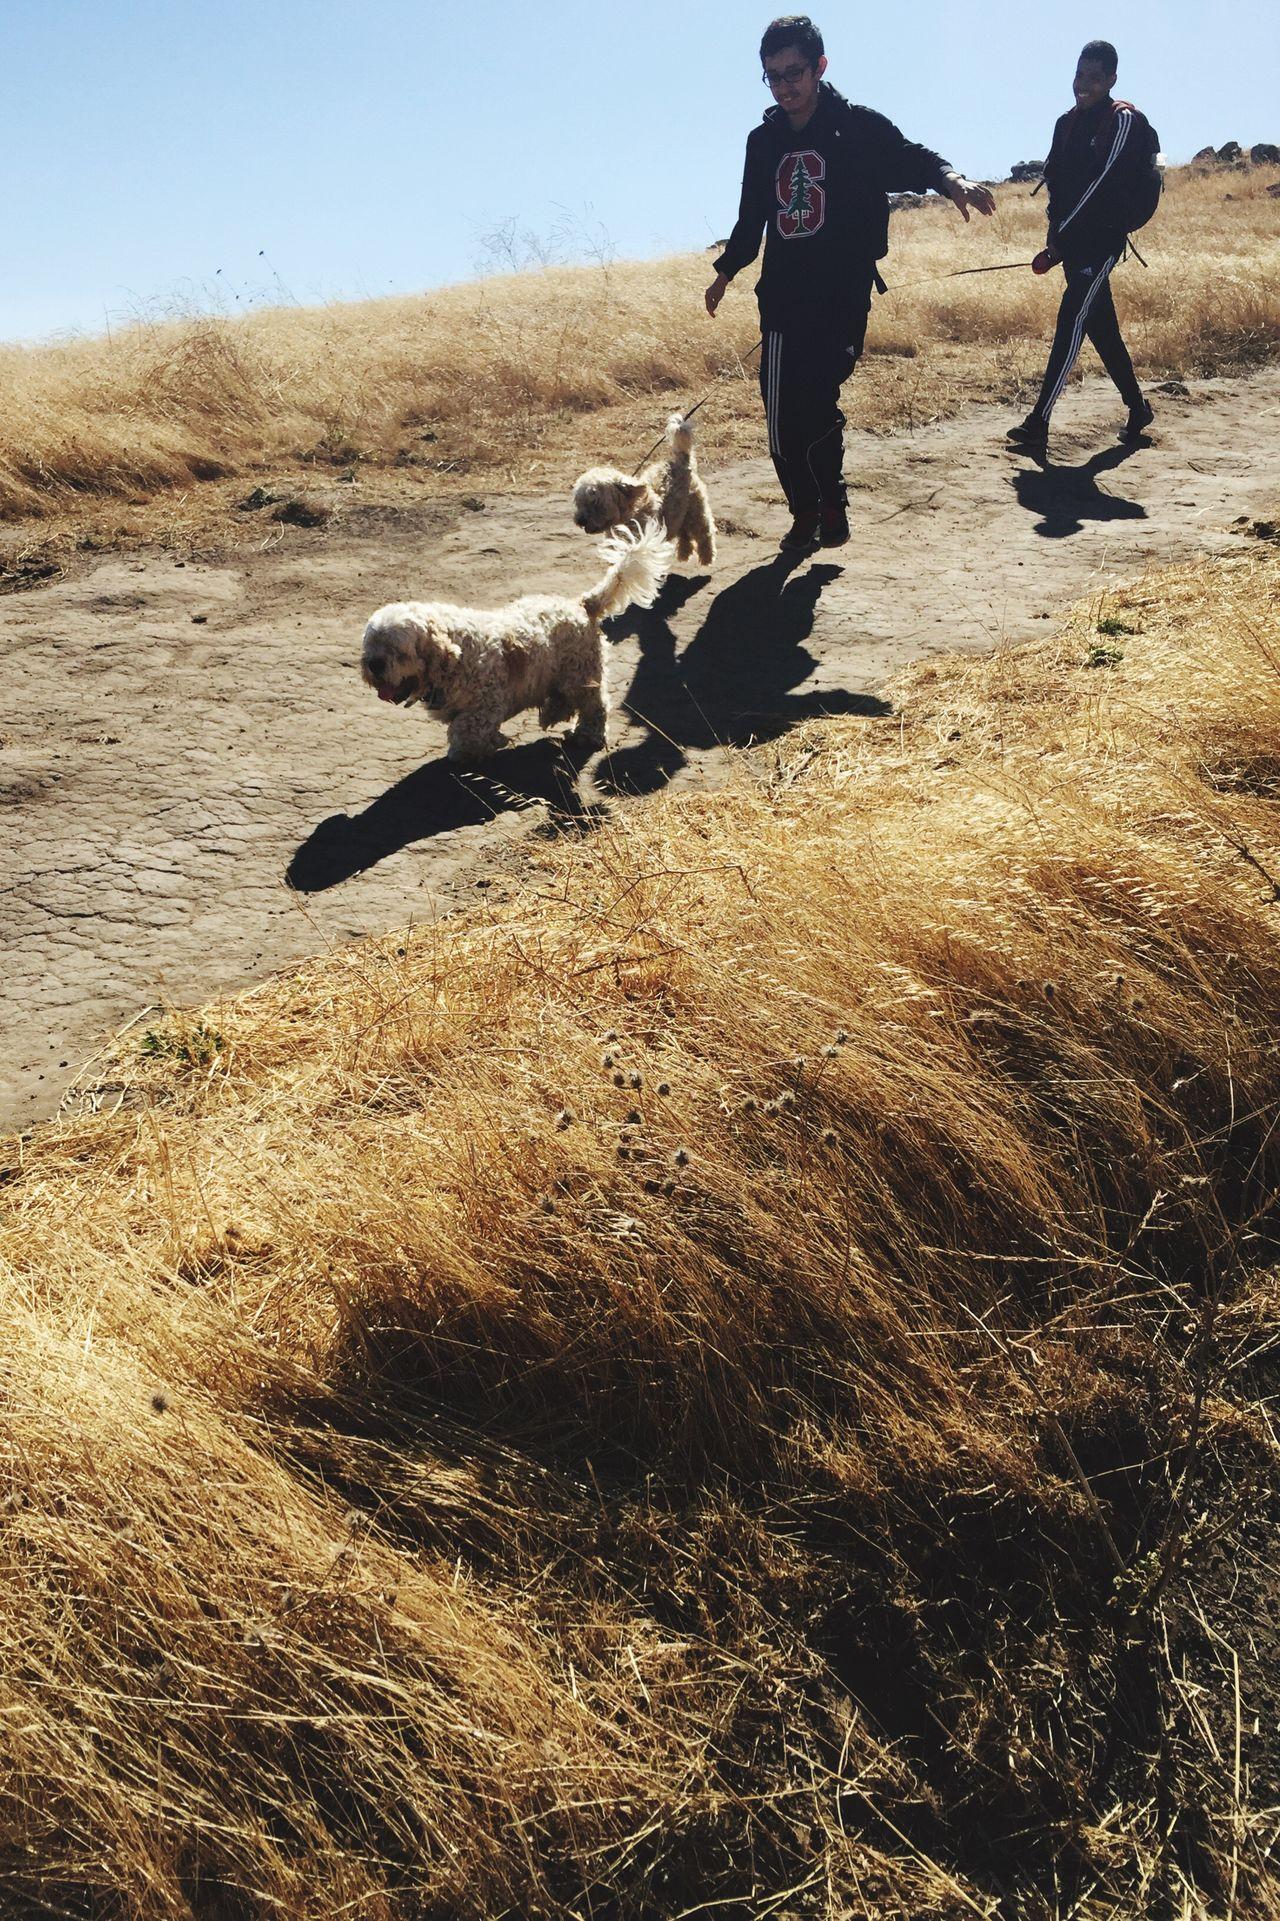 Dogs Dog Hiking Mountain Mission Peak Mission Peak Regional Reserve